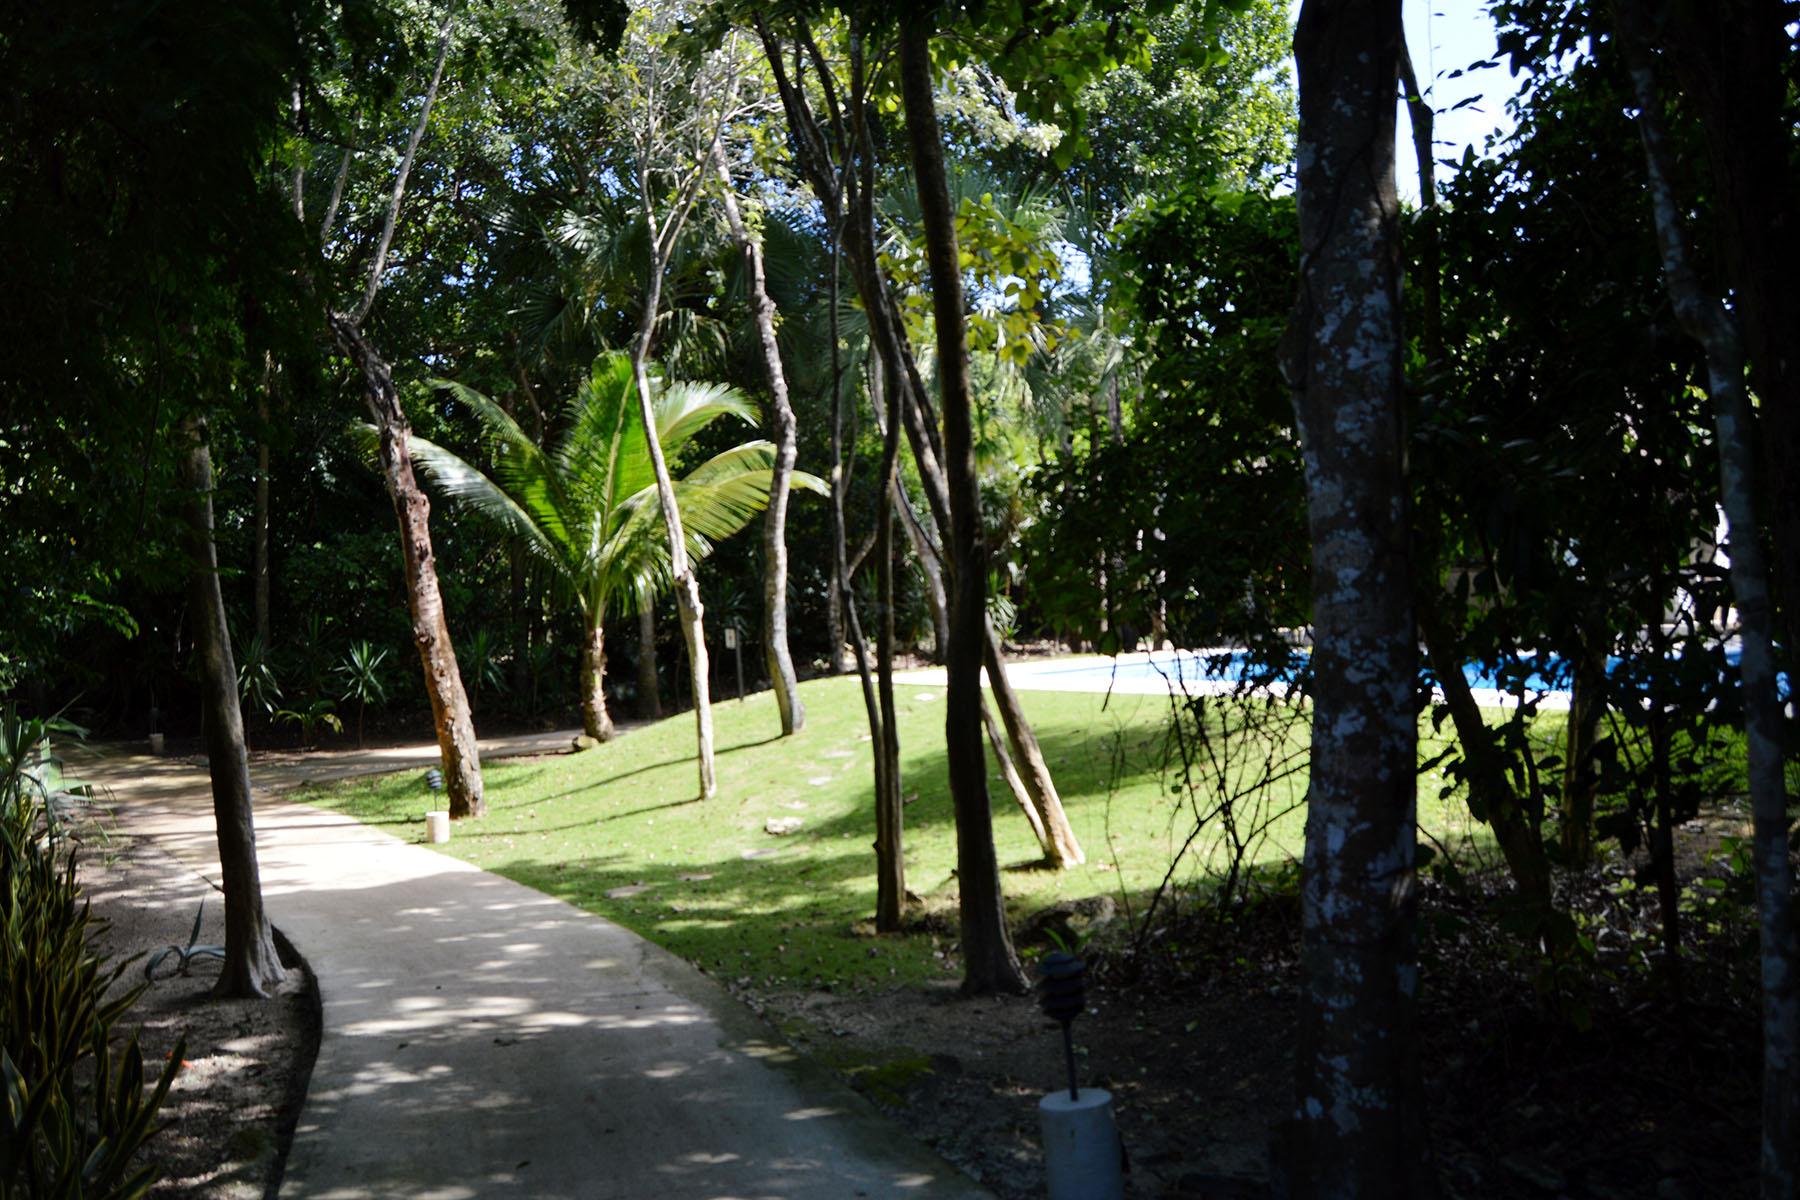 Additional photo for property listing at LOTE RESIDENCIAL 181 EN CLUB REAL 181 Club Real Residential Lot Retorno Copan Playa Del Carmen, Quintana Roo 77710 México